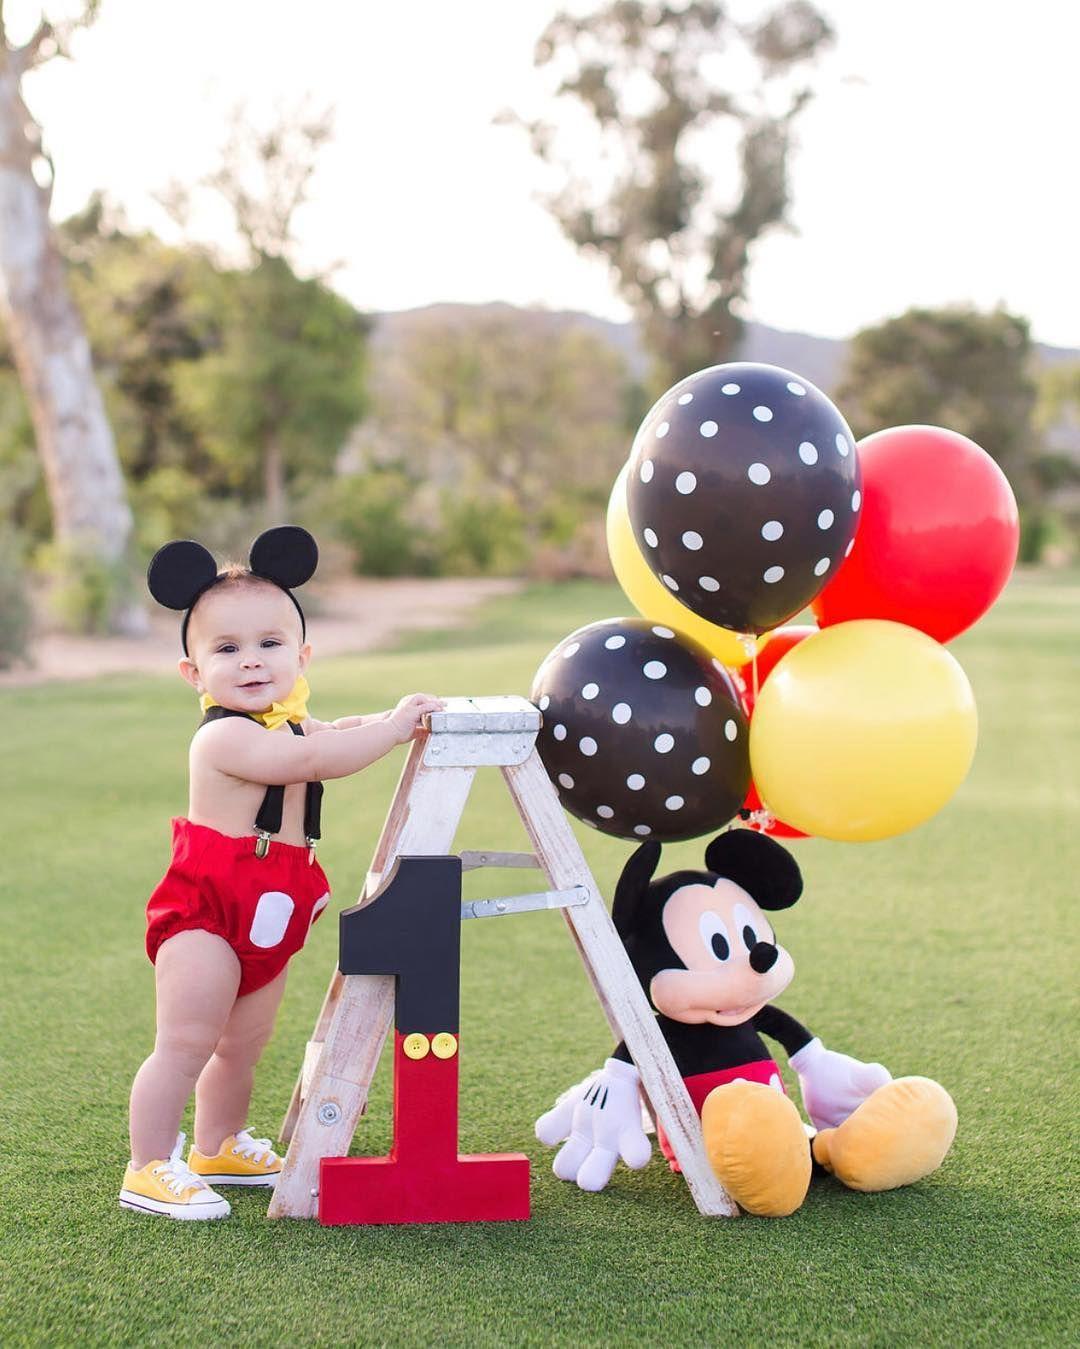 Mickey Mouse First Birthday Mickey Cake Smash Mickey Mouse Birthday Mickey Mouse P Mickey 1st Birthdays Mickey Mouse First Birthday Mickey First Birthday